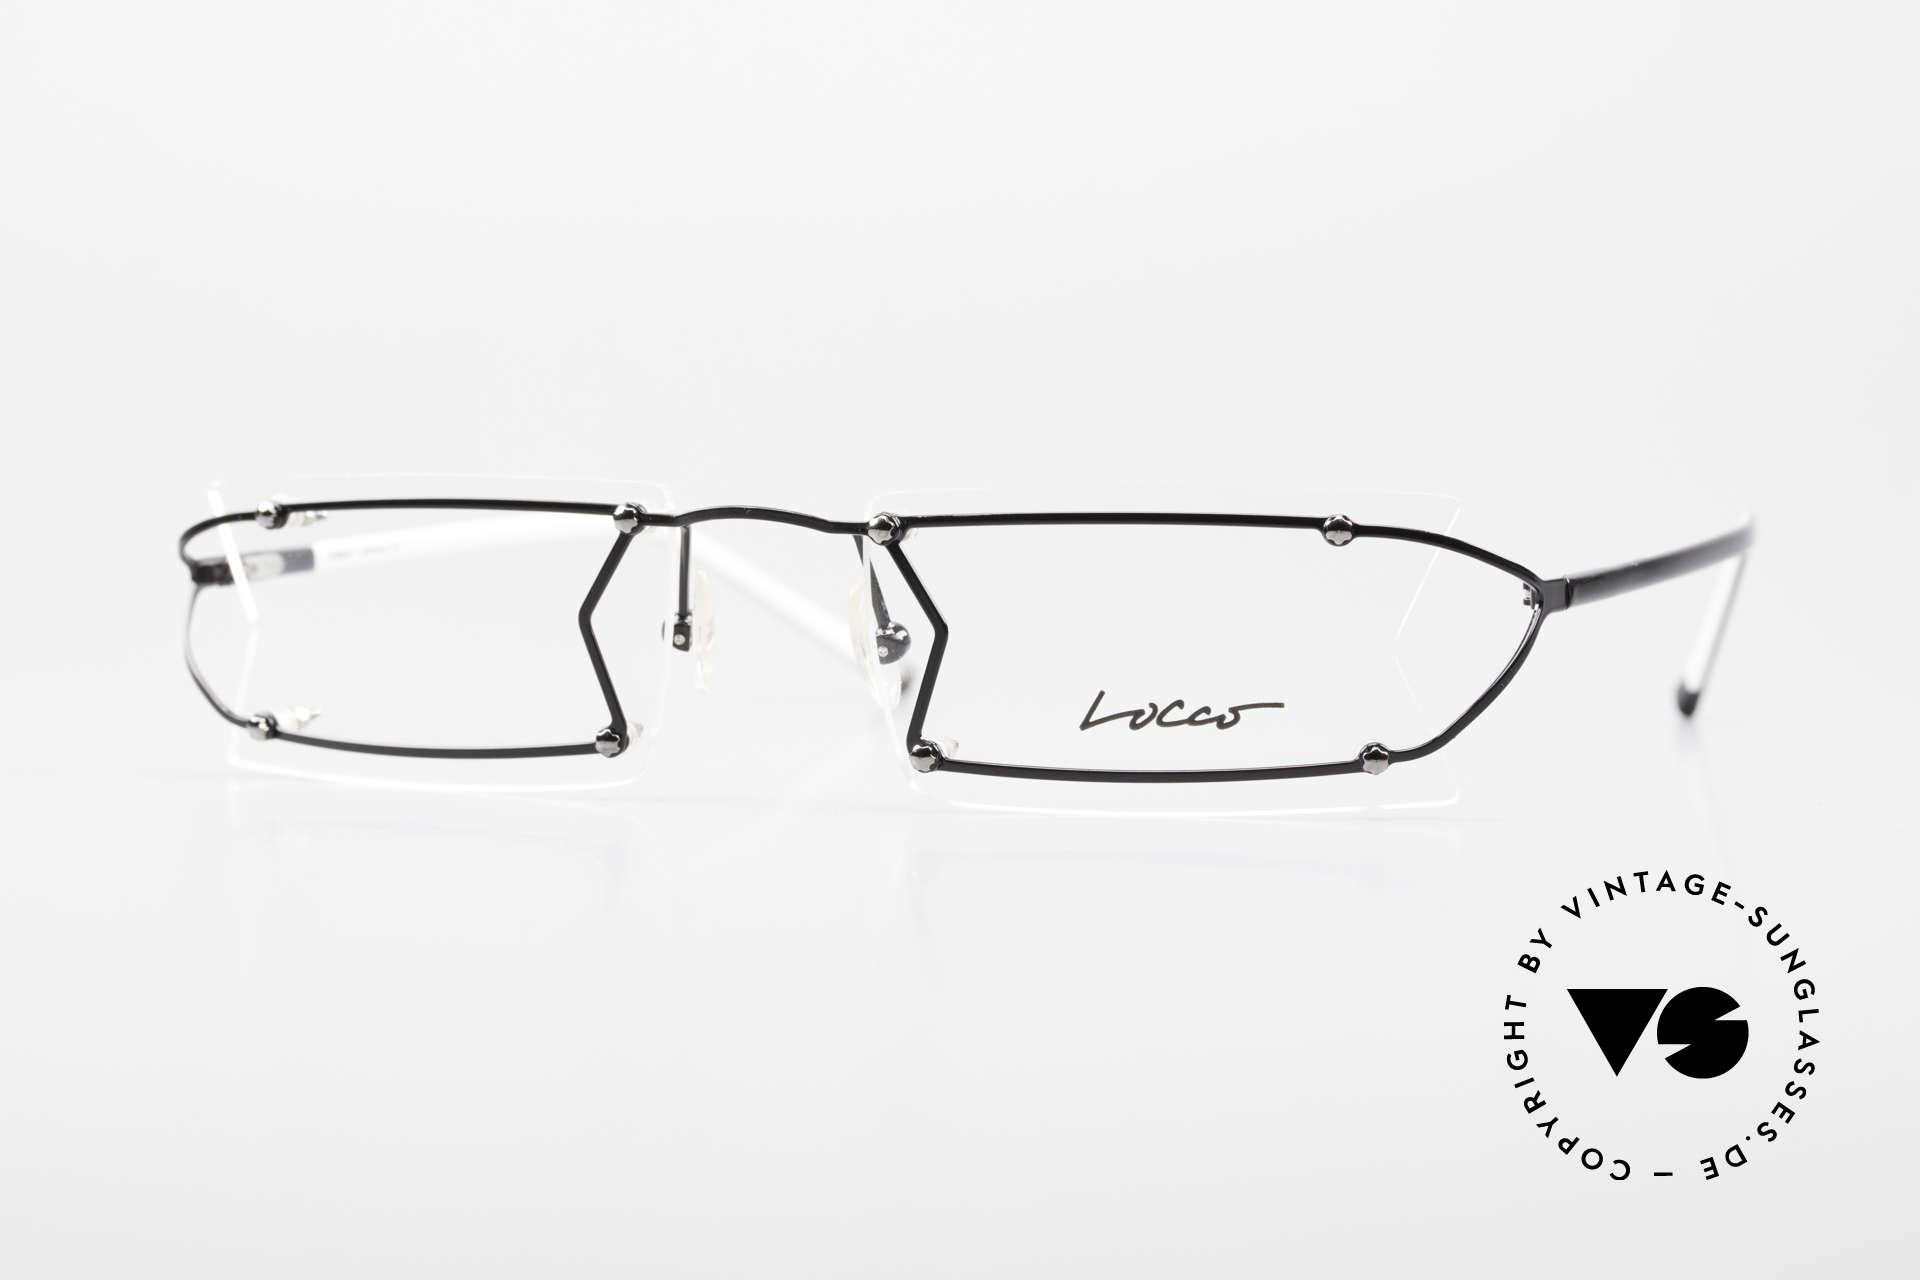 Locco Pinot Crazy 90's Rimless Eyeglasses, Locco Pinot 53-18, crazy rimless 1990's eyeglasses, Made for Men and Women